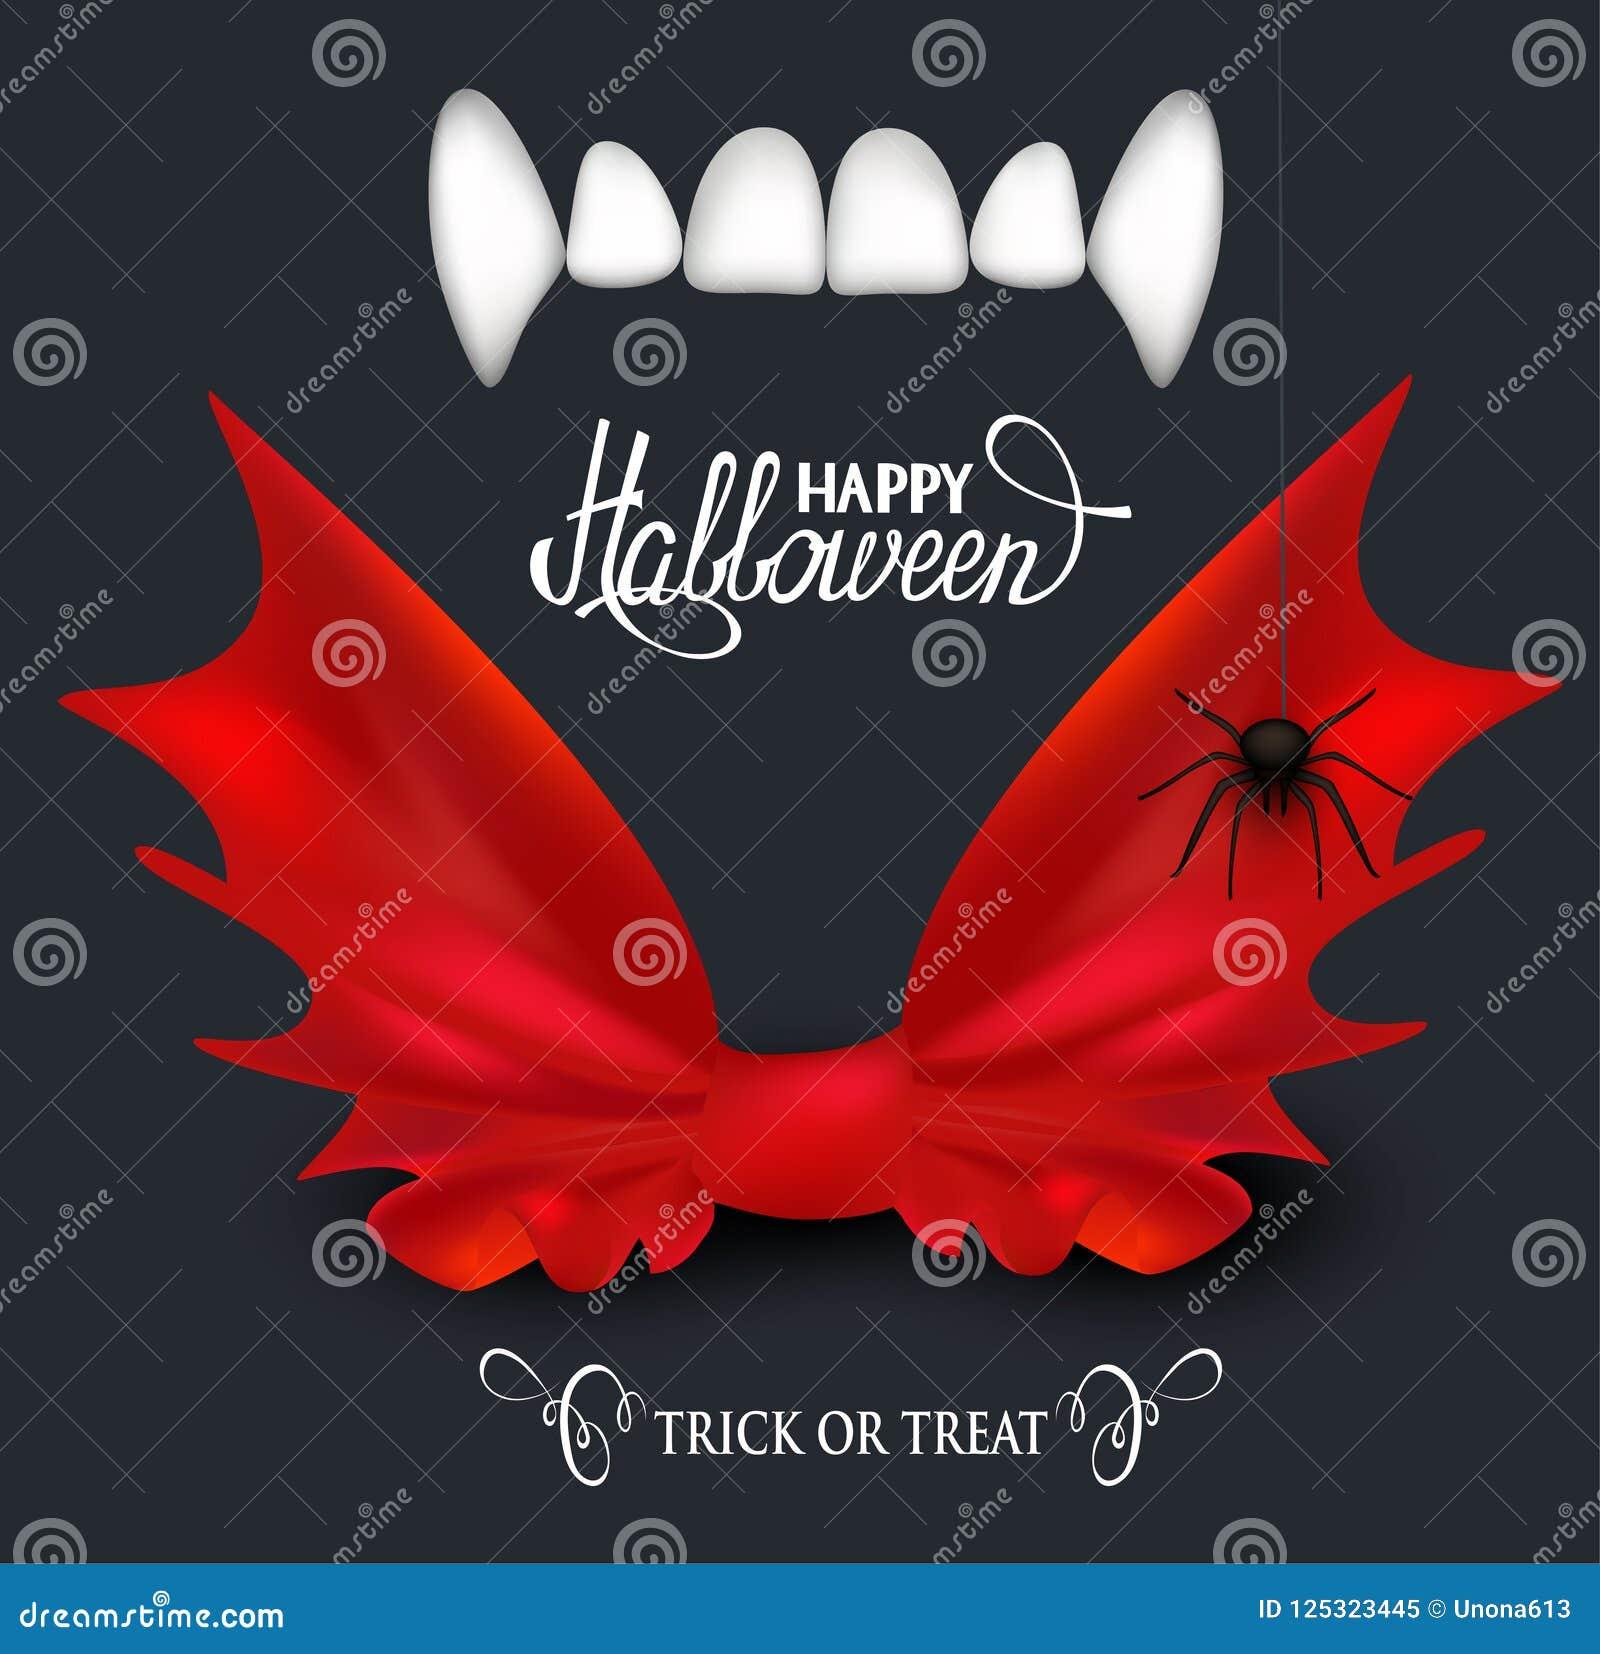 Vampire Teeth Font   www.topsimages.com